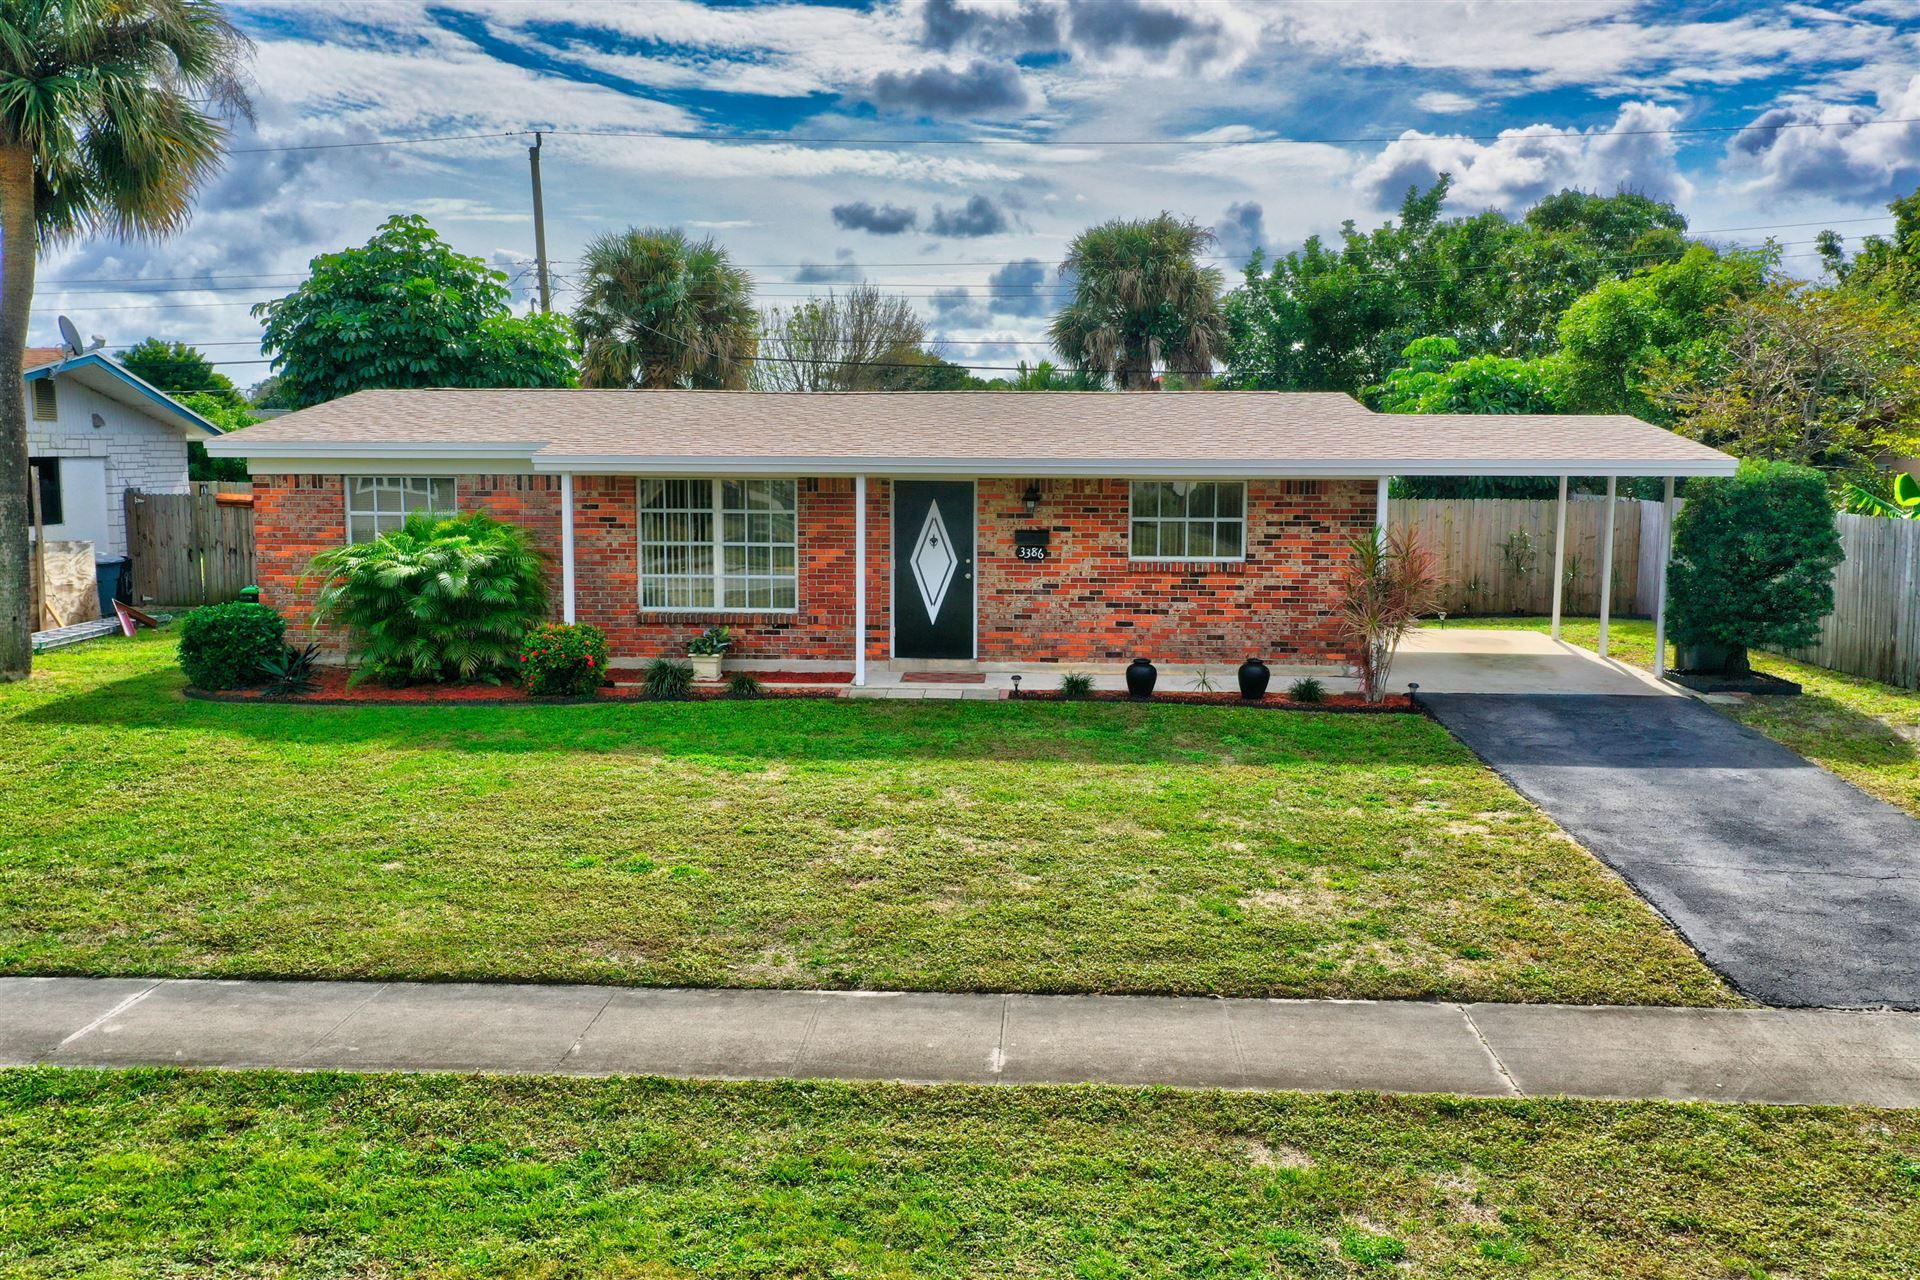 Photo of 3386 Florida Boulevard, Palm Beach Gardens, FL 33410 (MLS # RX-10685300)